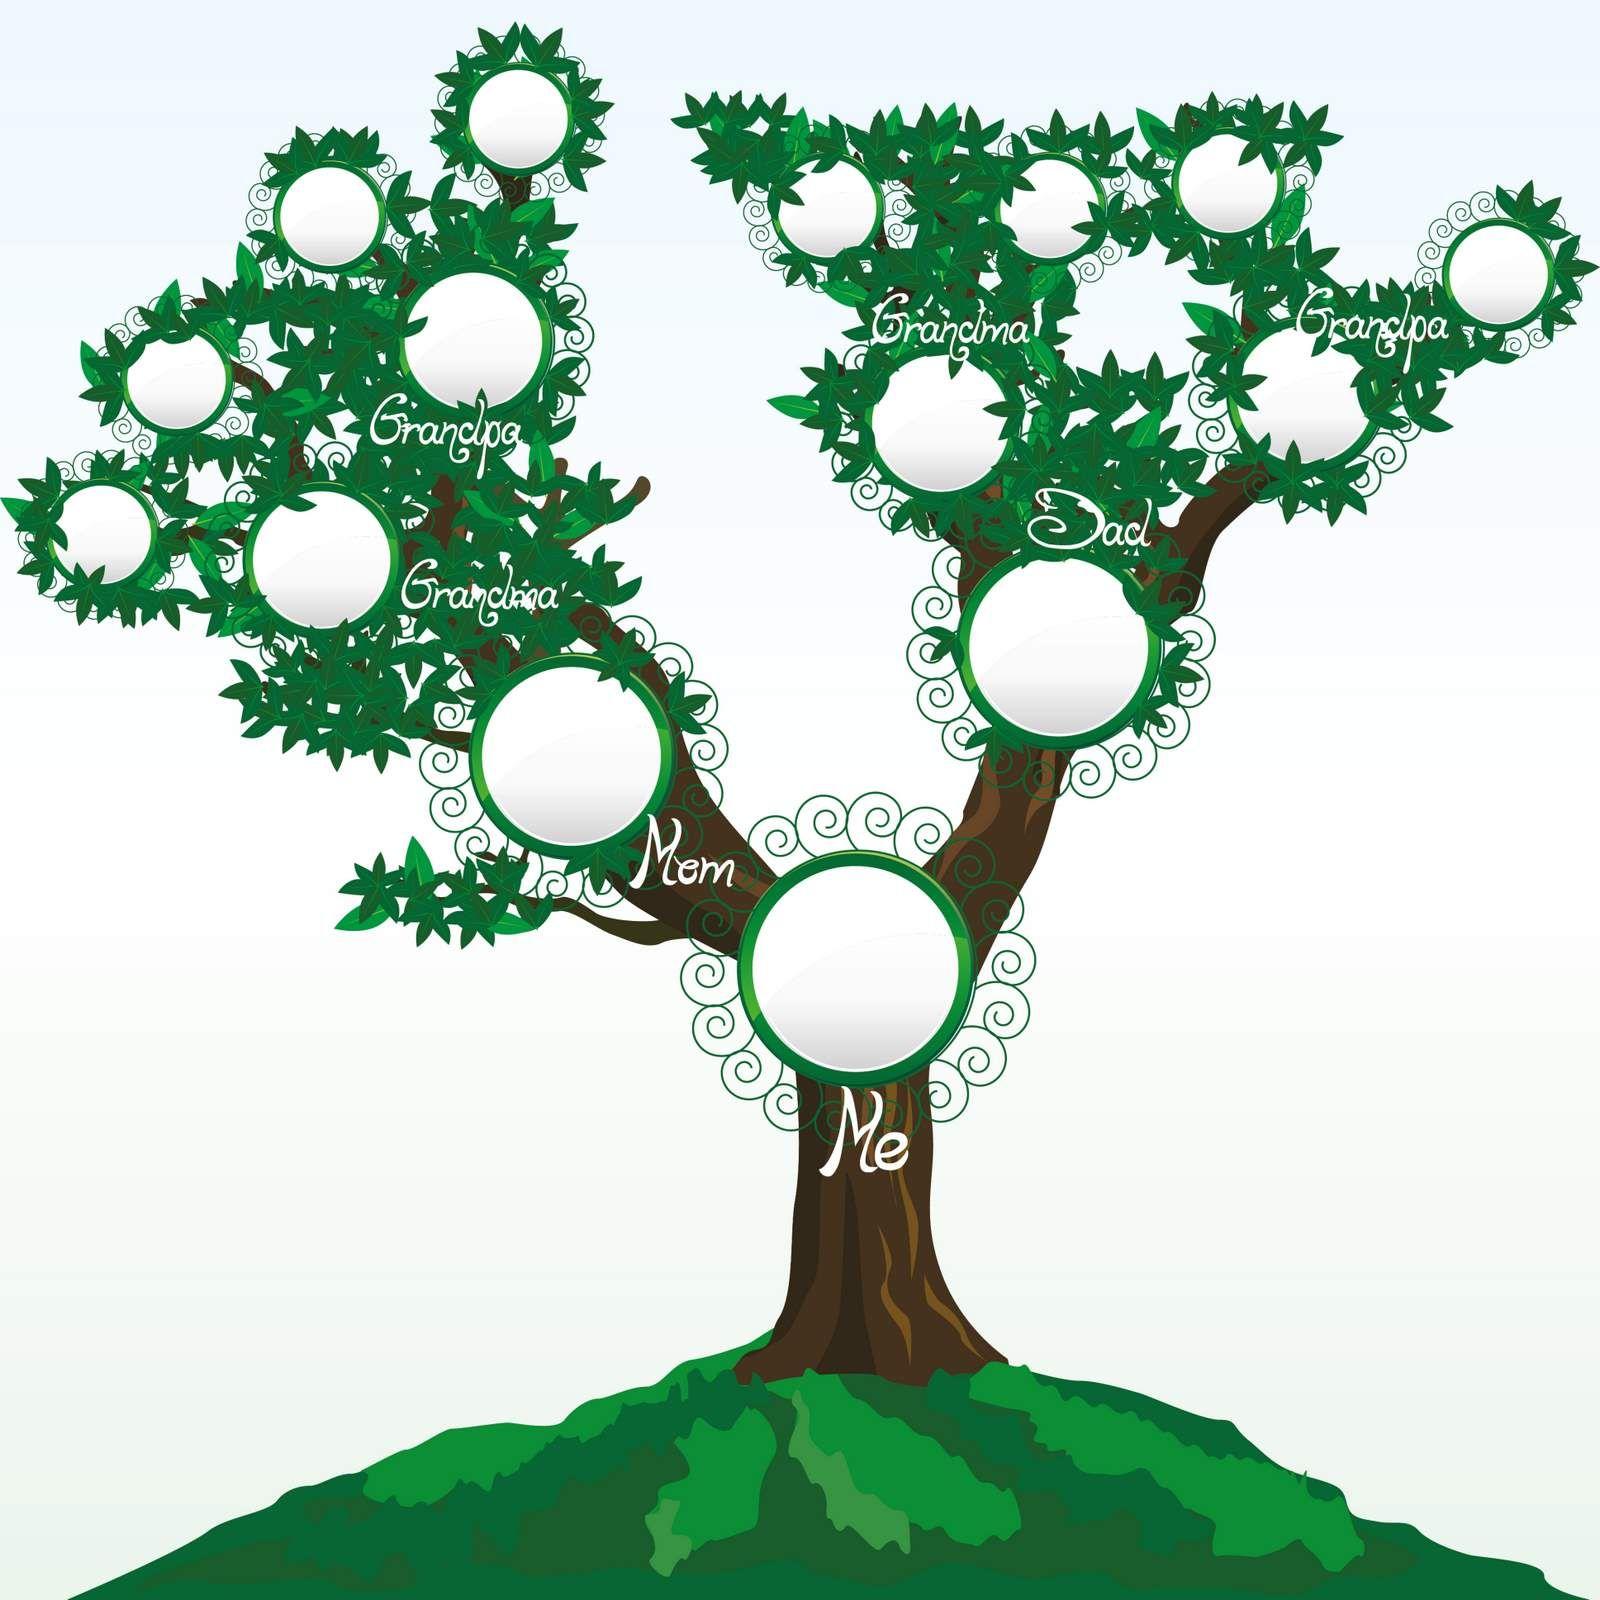 Free ancestry tree free family tree stammbaum pinterest - Stammbaum basteln mit kindern ...